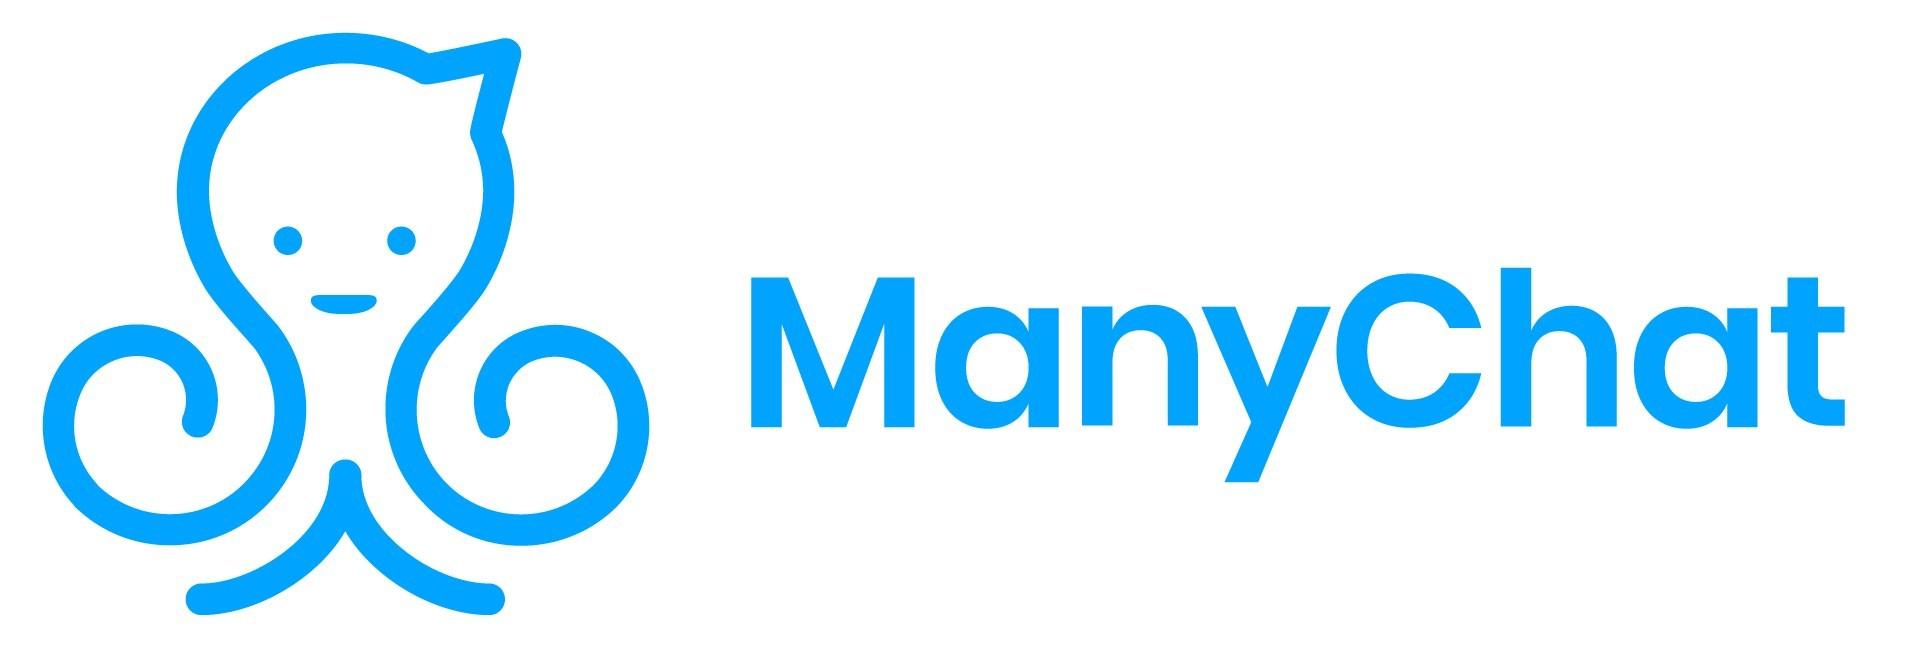 Mandychat